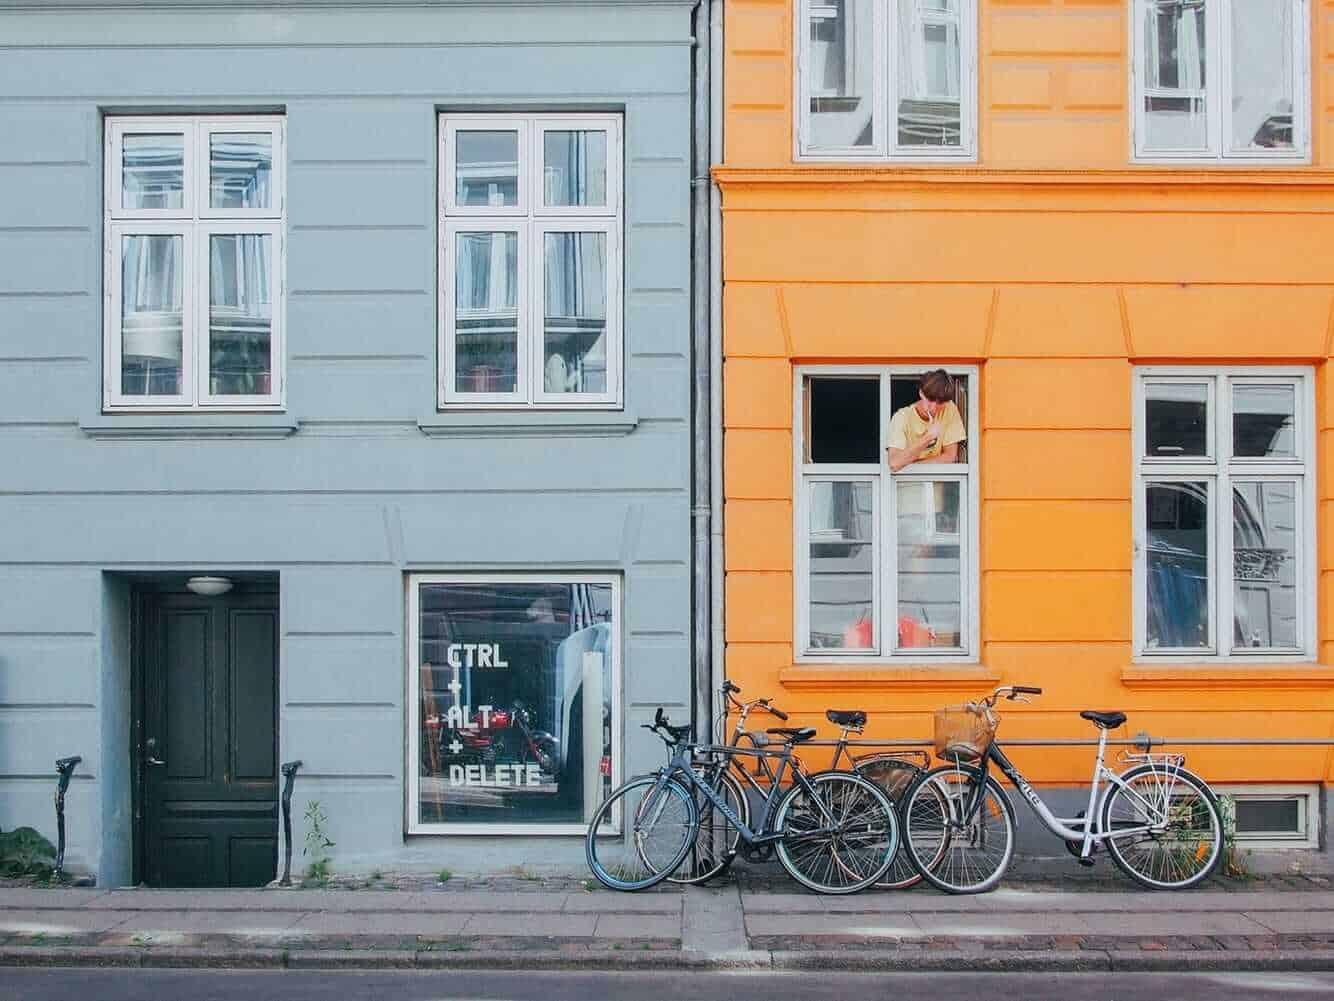 Copenhagen and Bikes